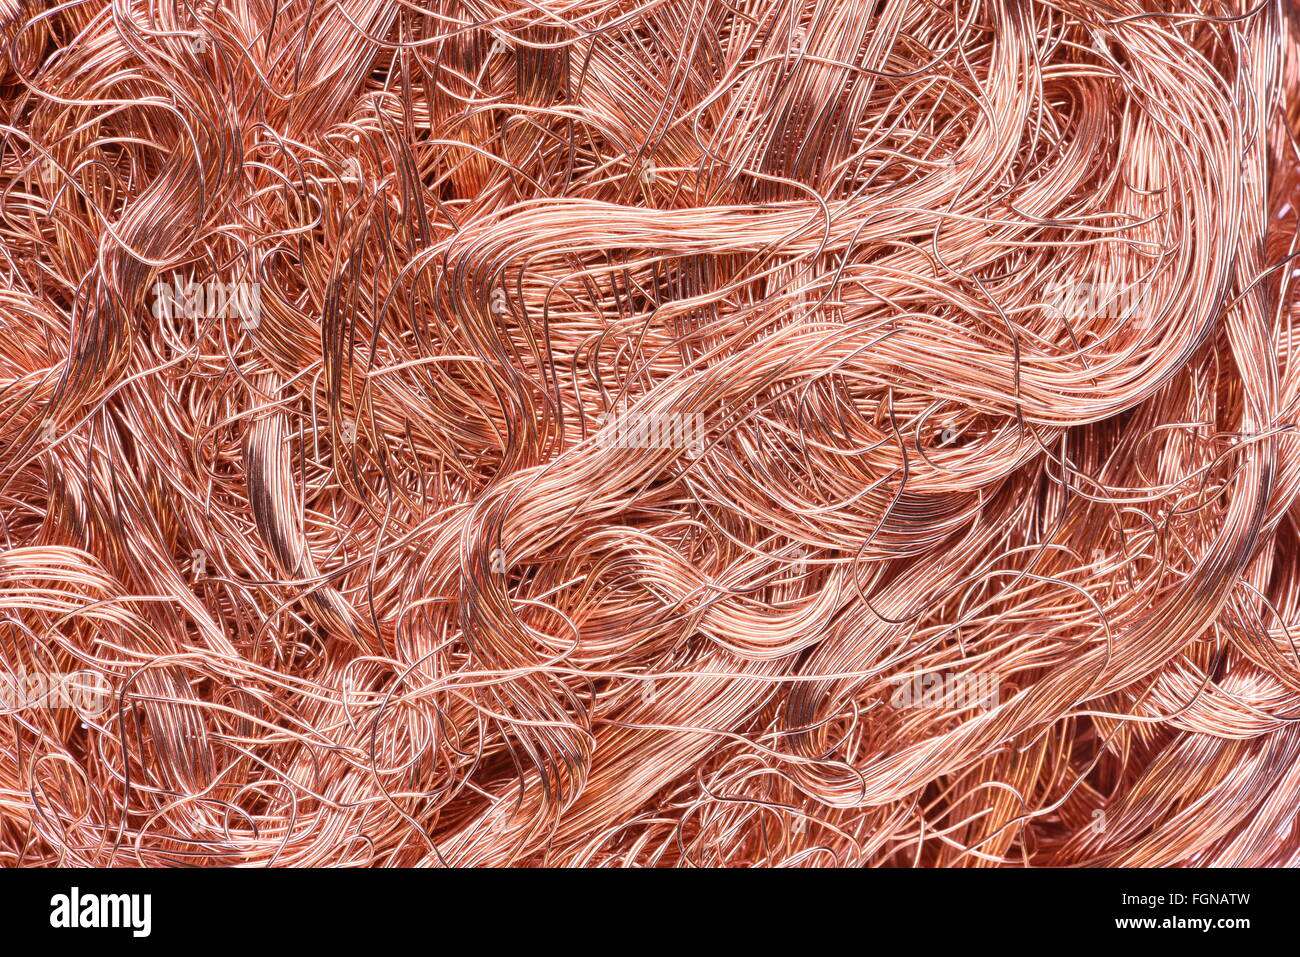 Copper Wire Industrial Raw Materials Stockfotos & Copper Wire ...